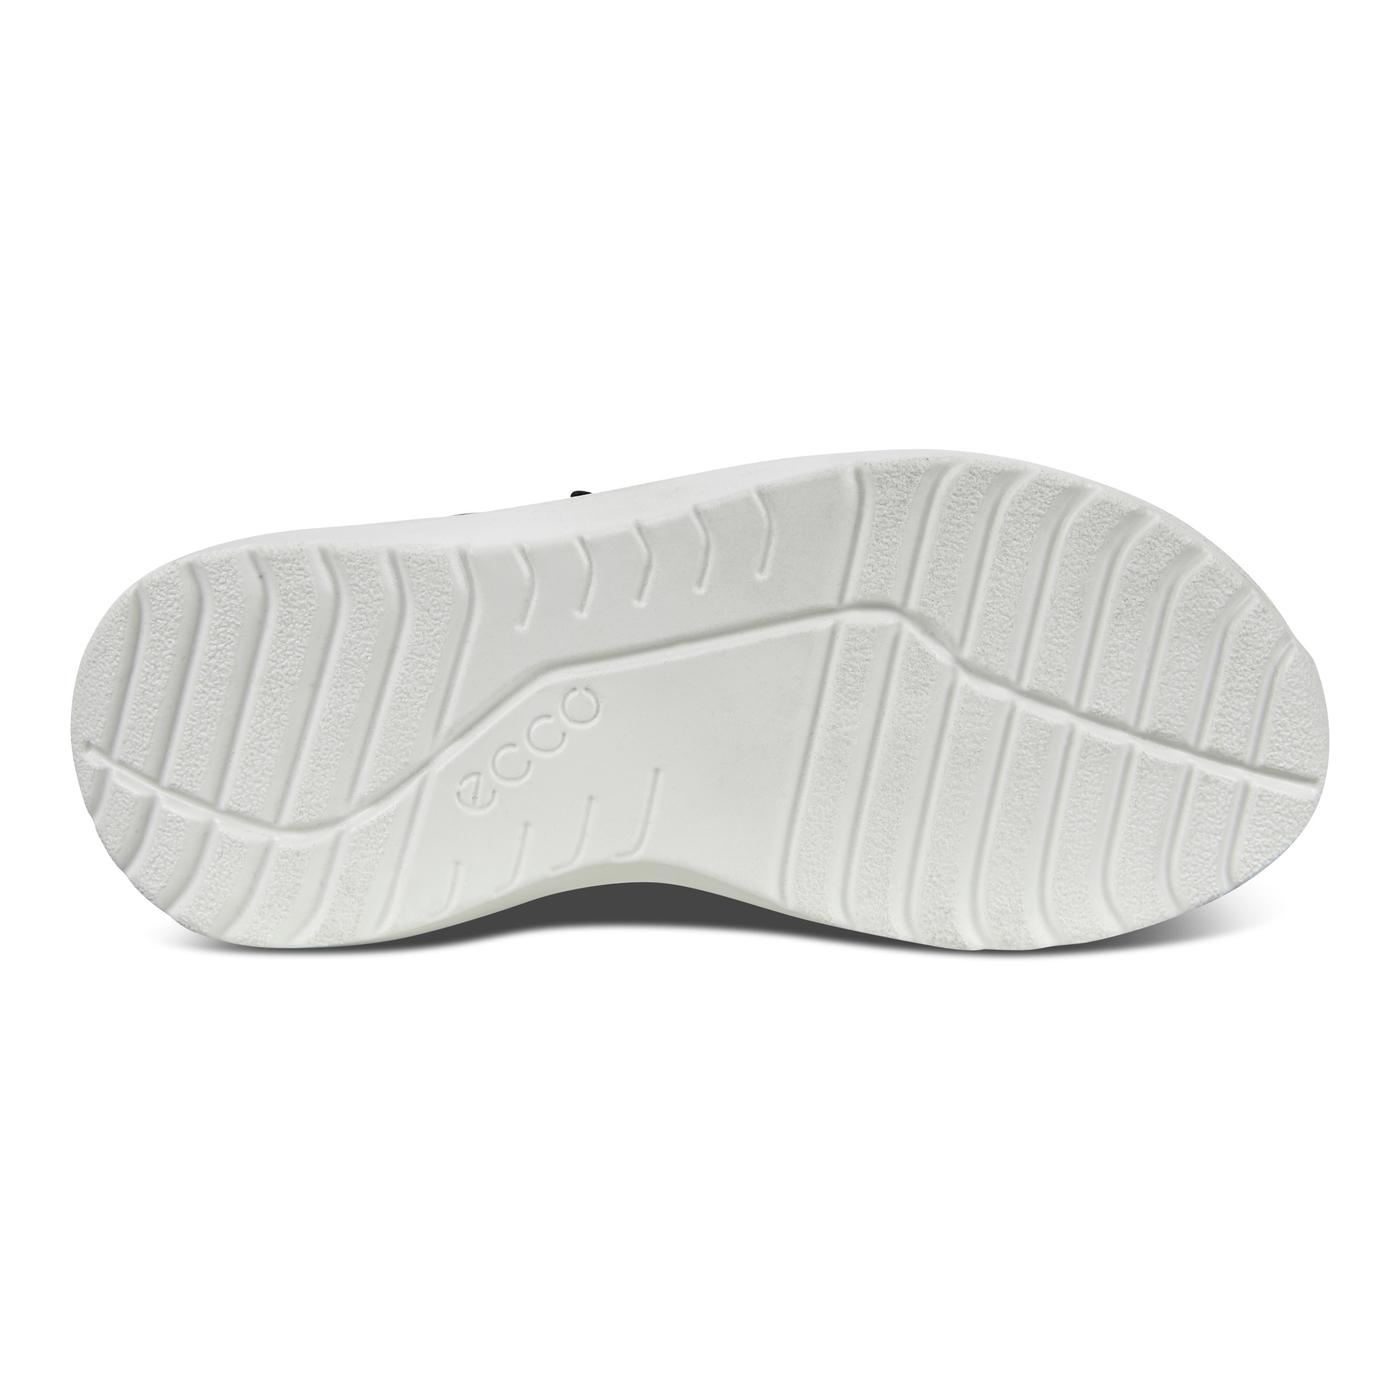 Chaussure ECCO Intervene